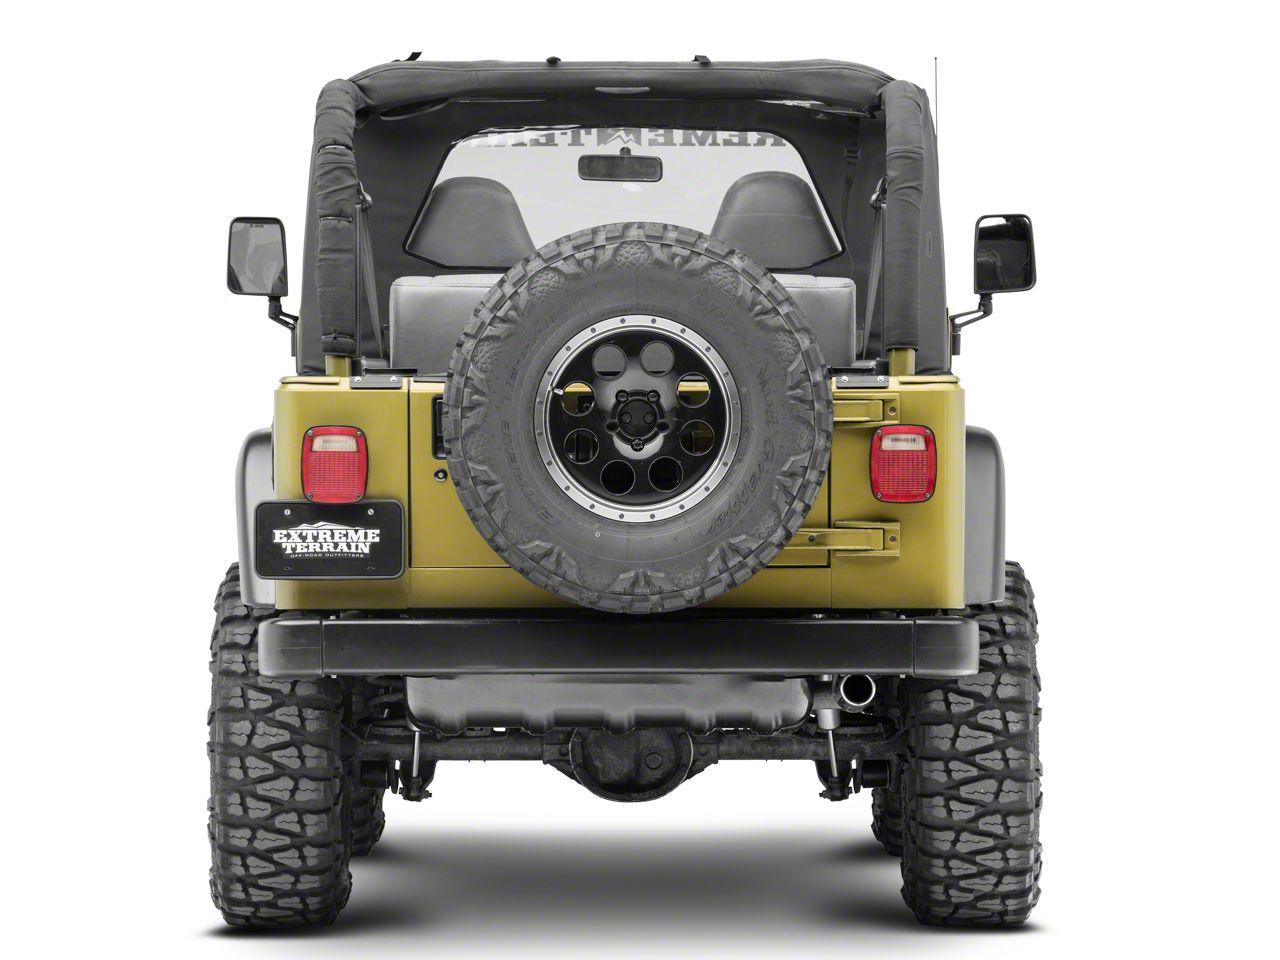 Flywheel Stator Cover Gasket OEM Yamaha YFZ450 YFZ 450 04-13 5TG-15451-00-00